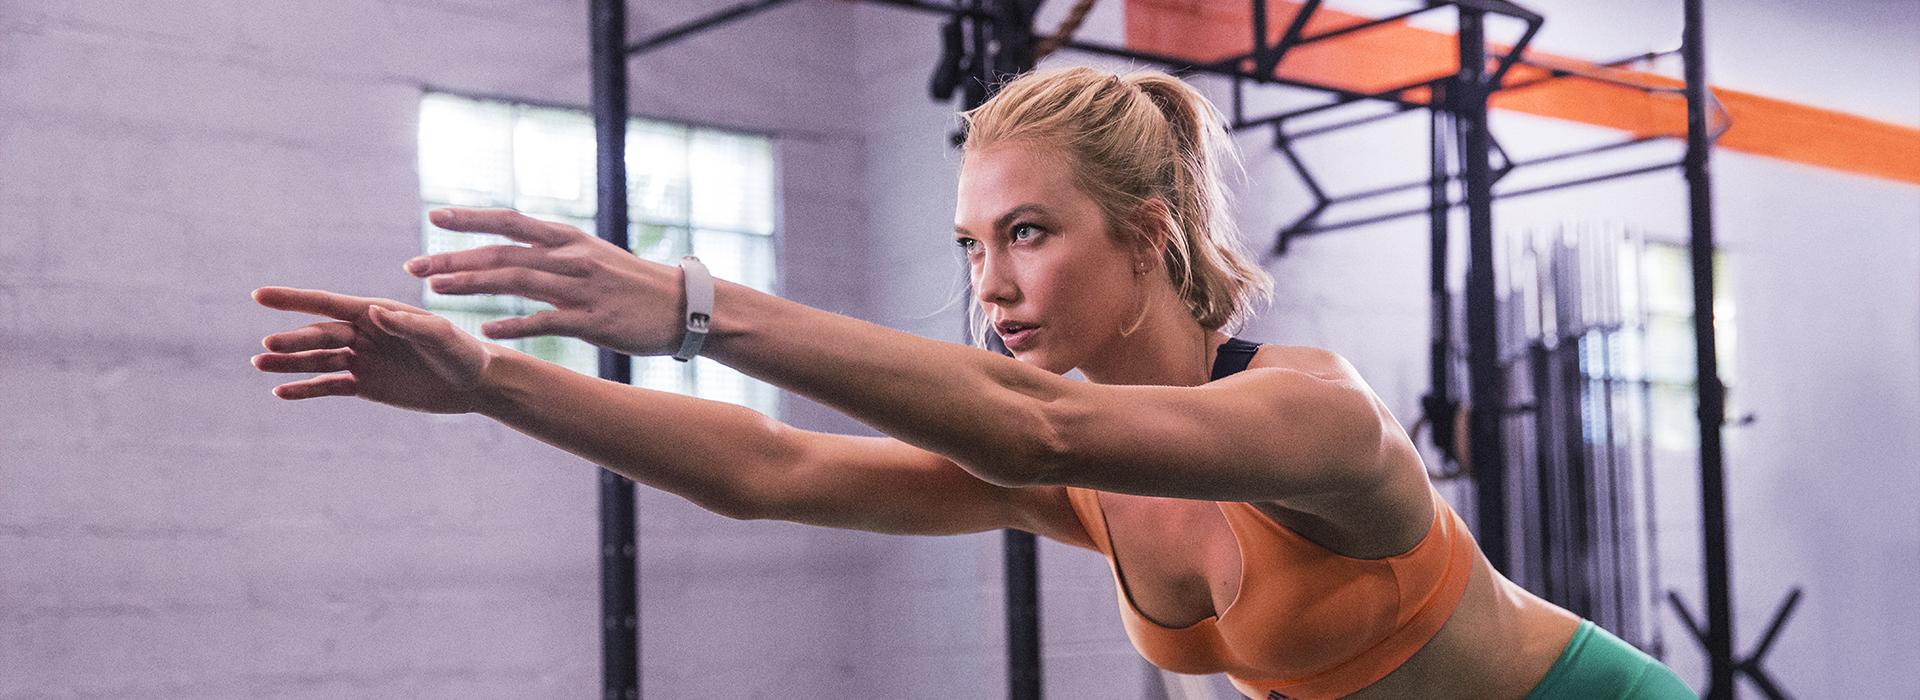 Travel fitness adidas imagine a lady Karlie Kloss